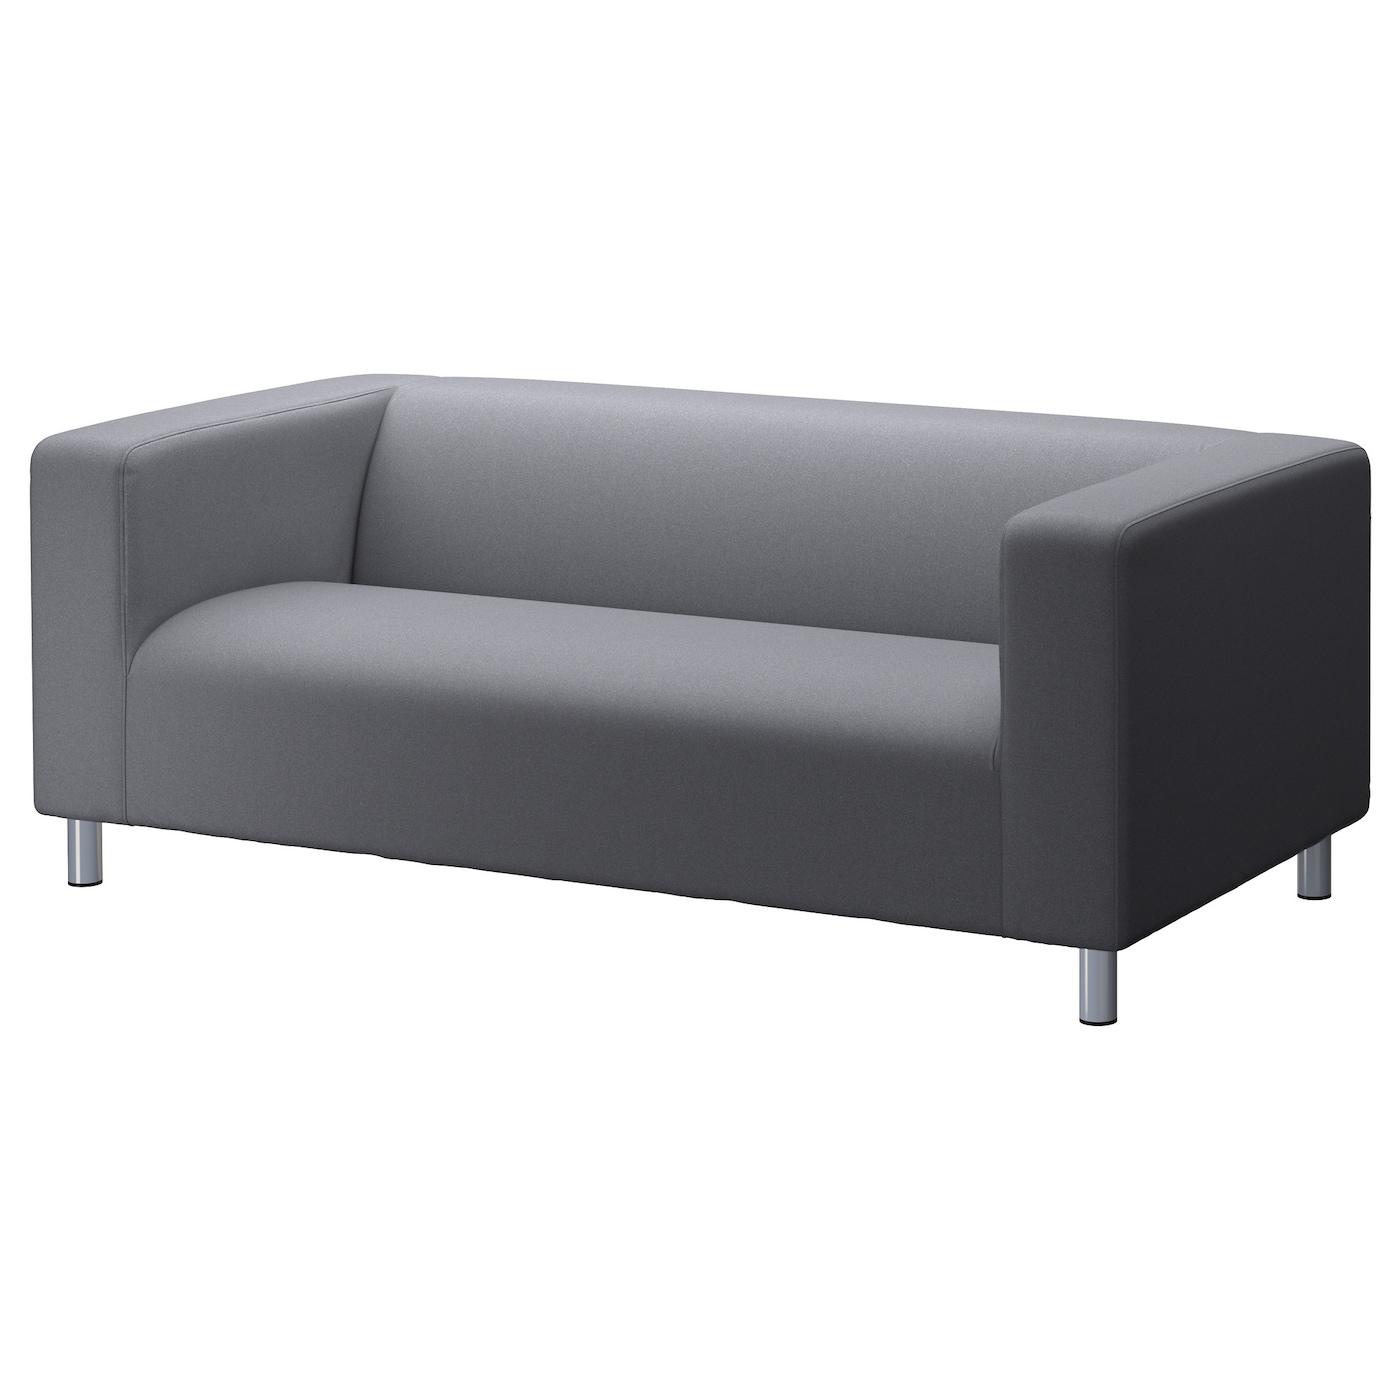 KLIPPAN Flackarp medium grey, Cover for